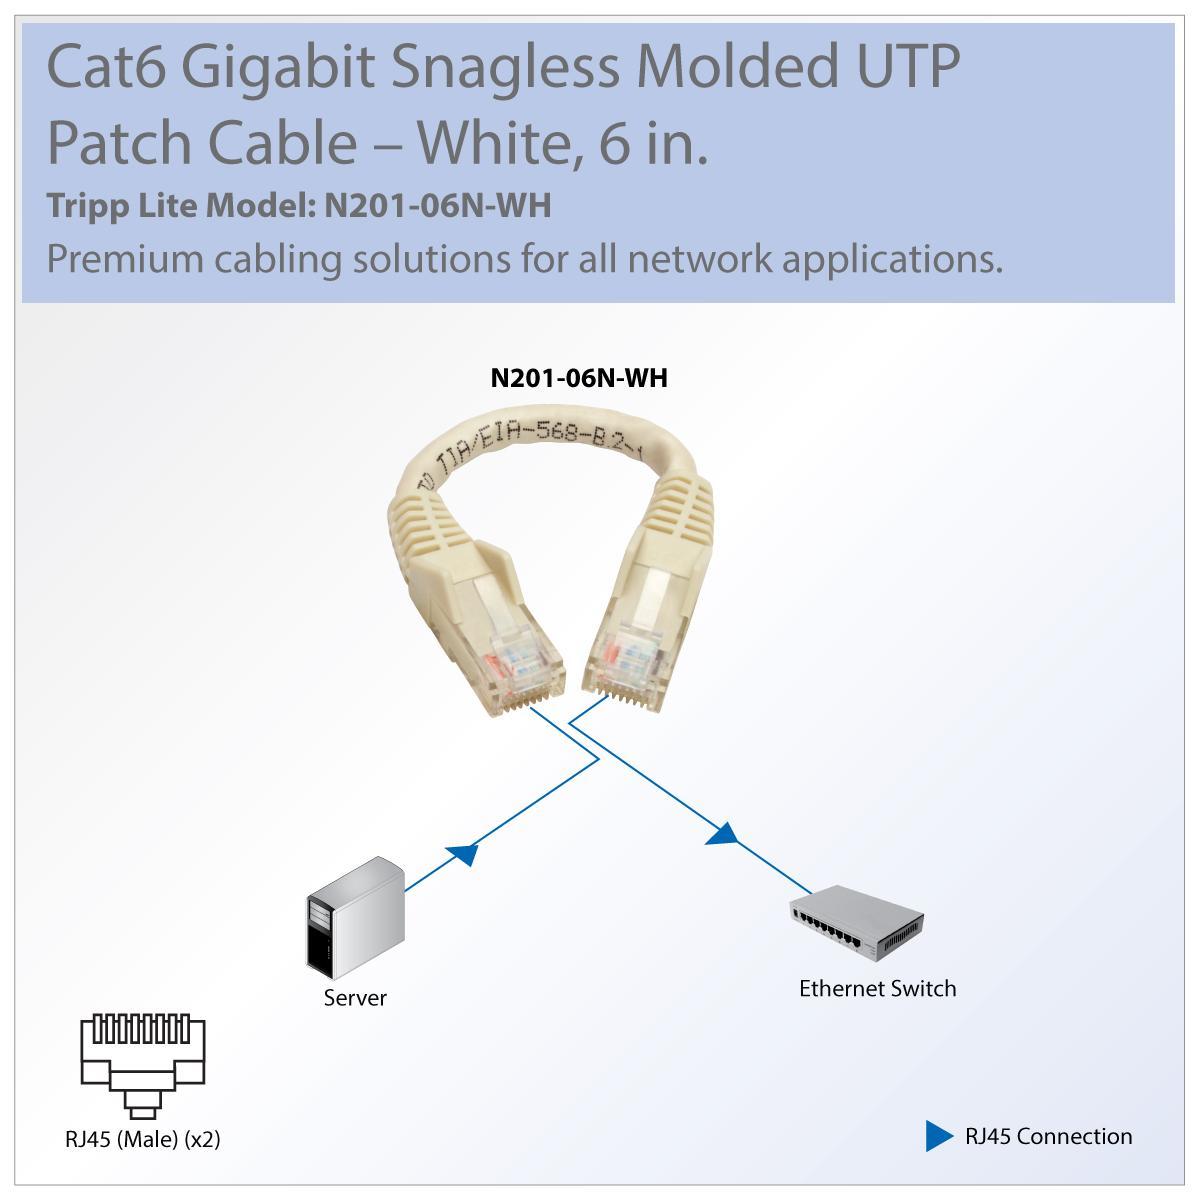 Tripp Lite Cat6 Gigabit Ethernet Snagless Molded Patch Cable Diagram View Larger